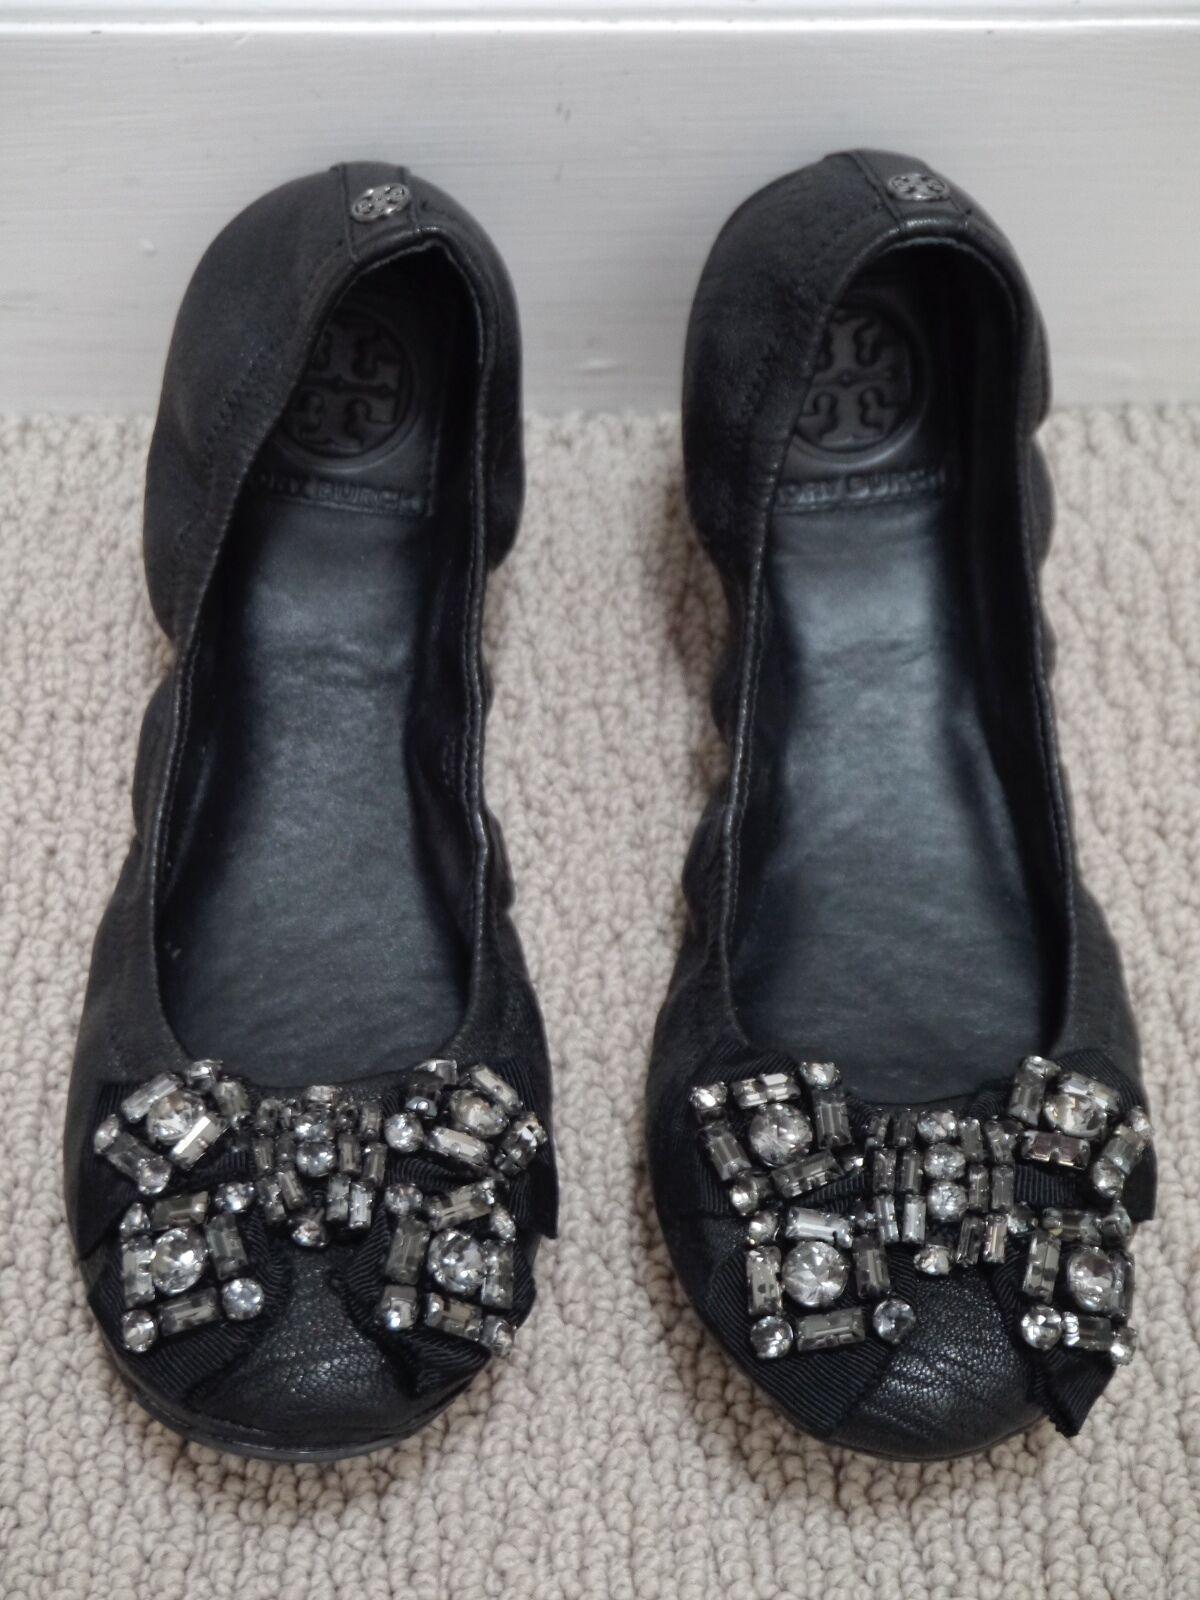 TORY BURCH  250 black leather crystal bow Azalea Eddie ballet flat 7.5 WORN ONCE